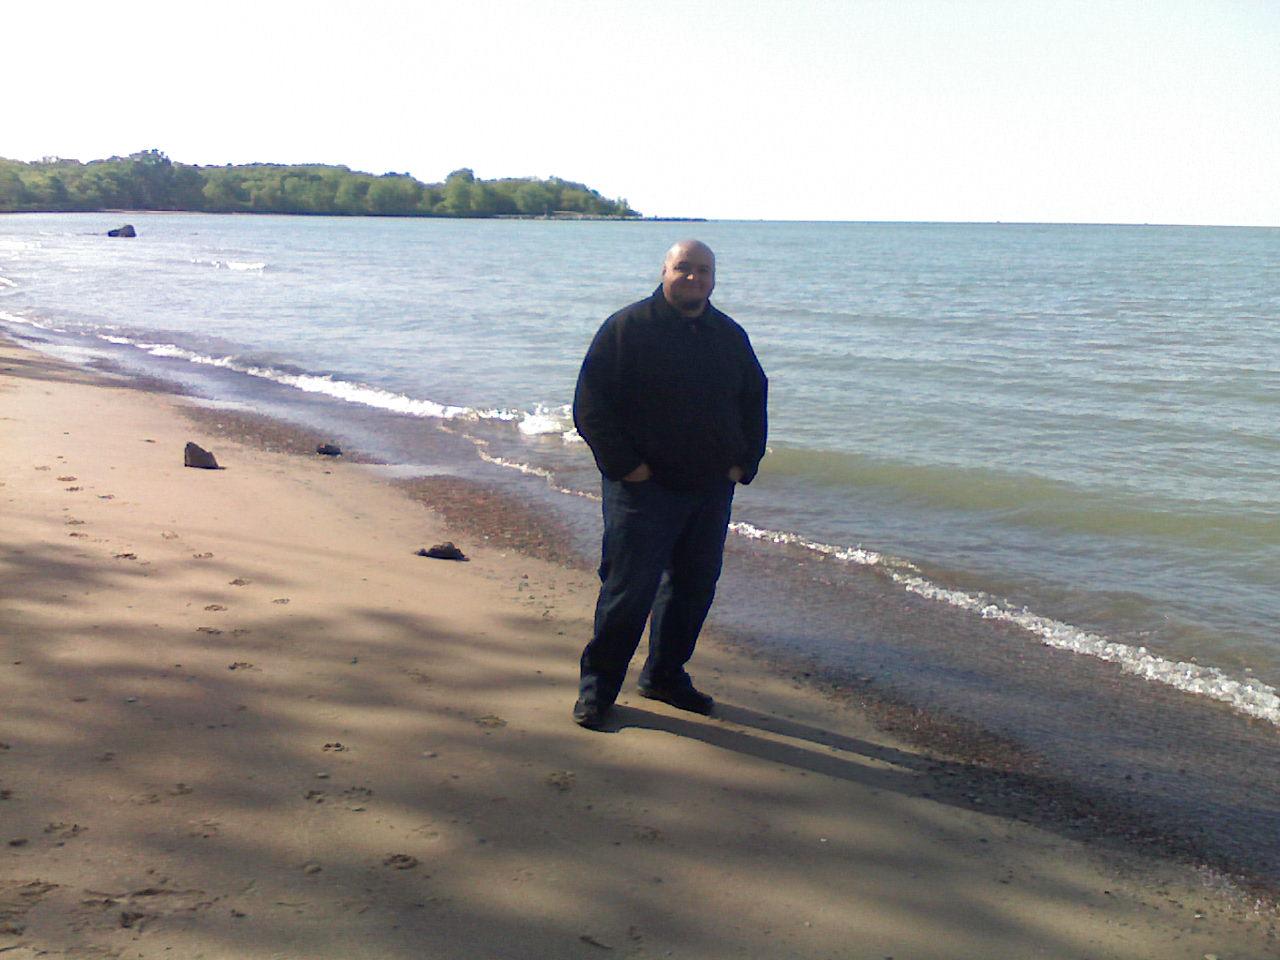 [andy+beach]